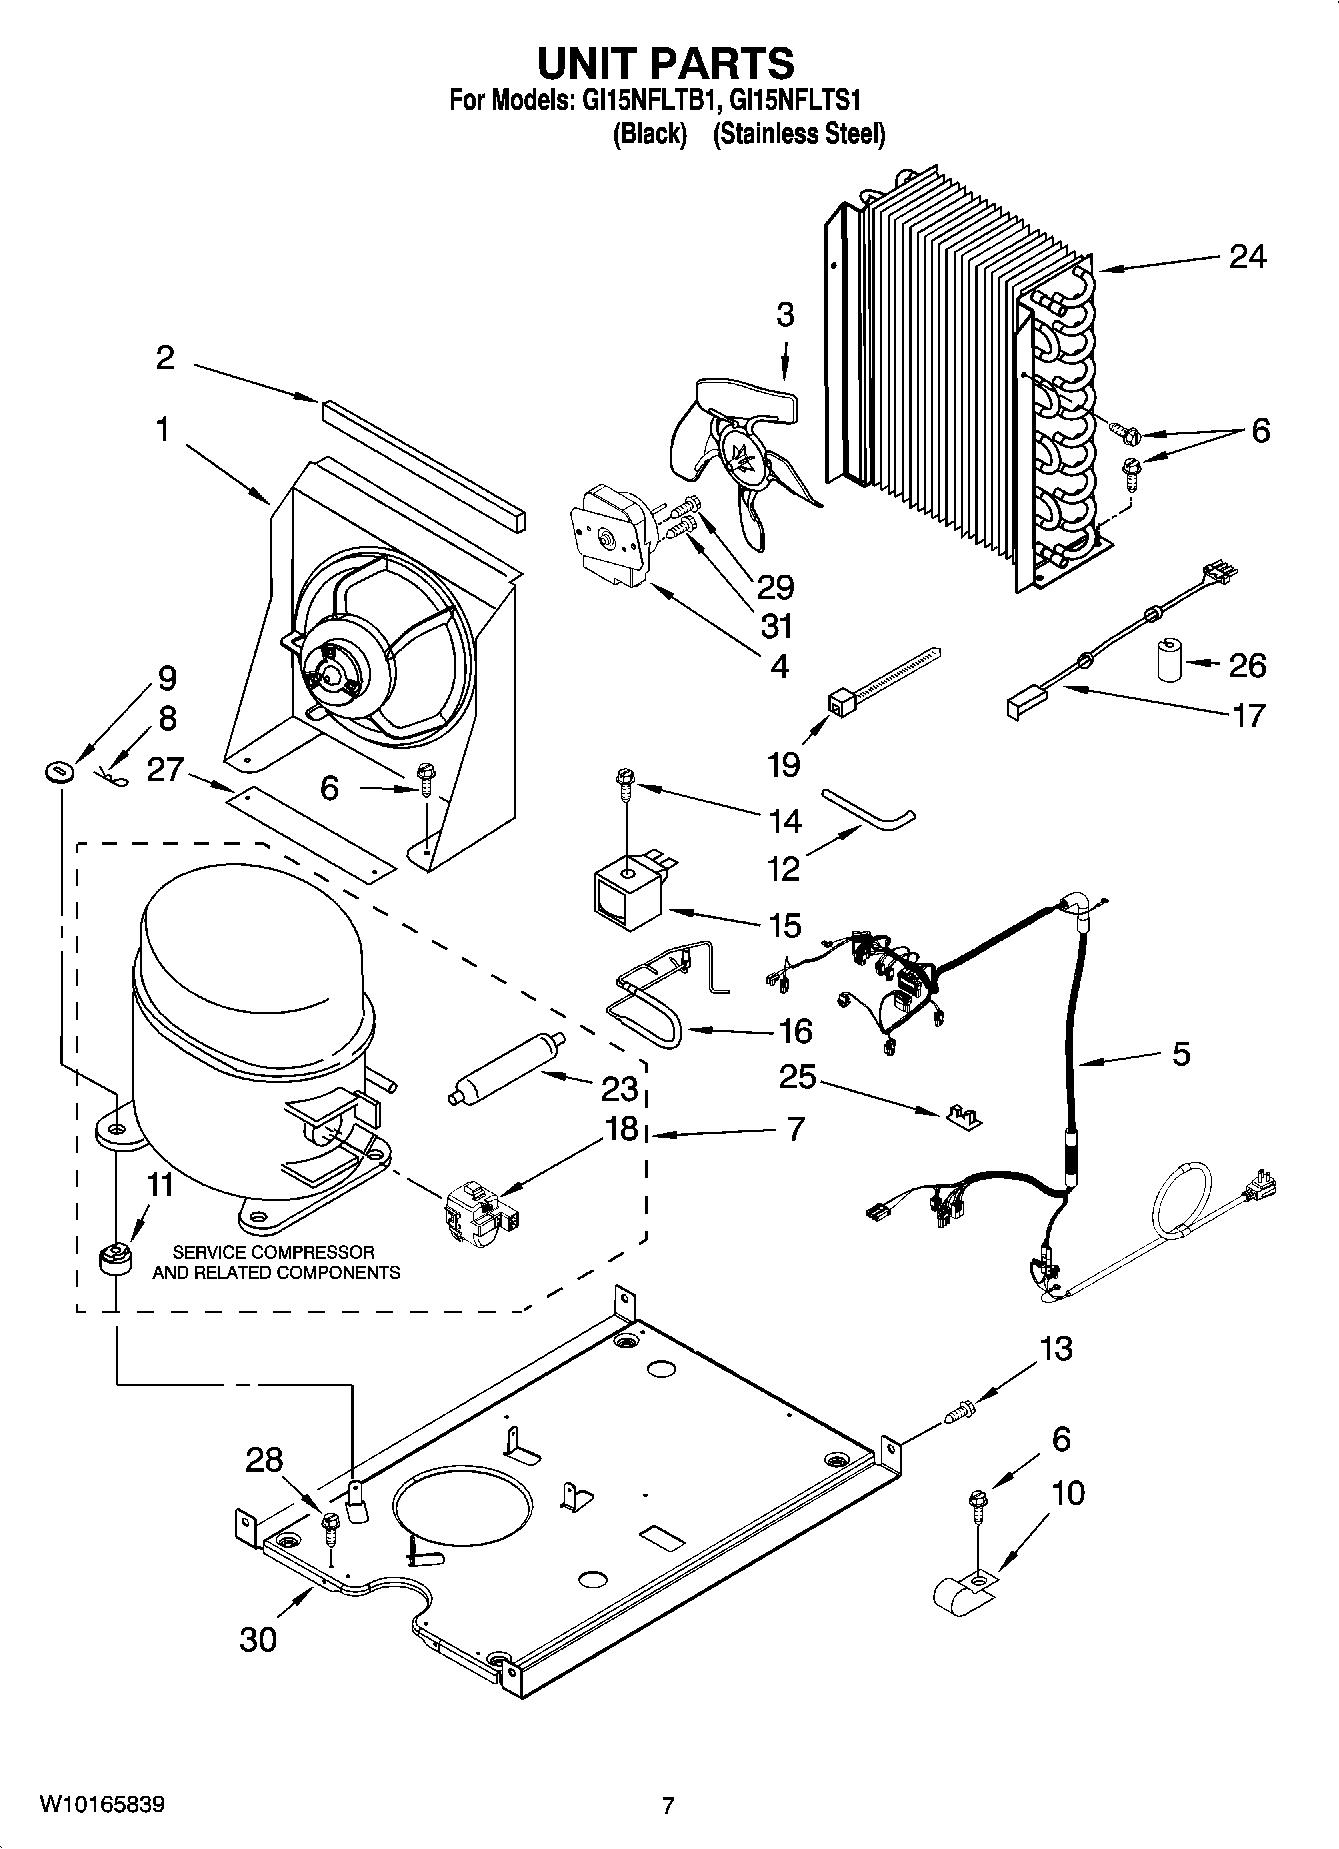 GI15NFLTB1